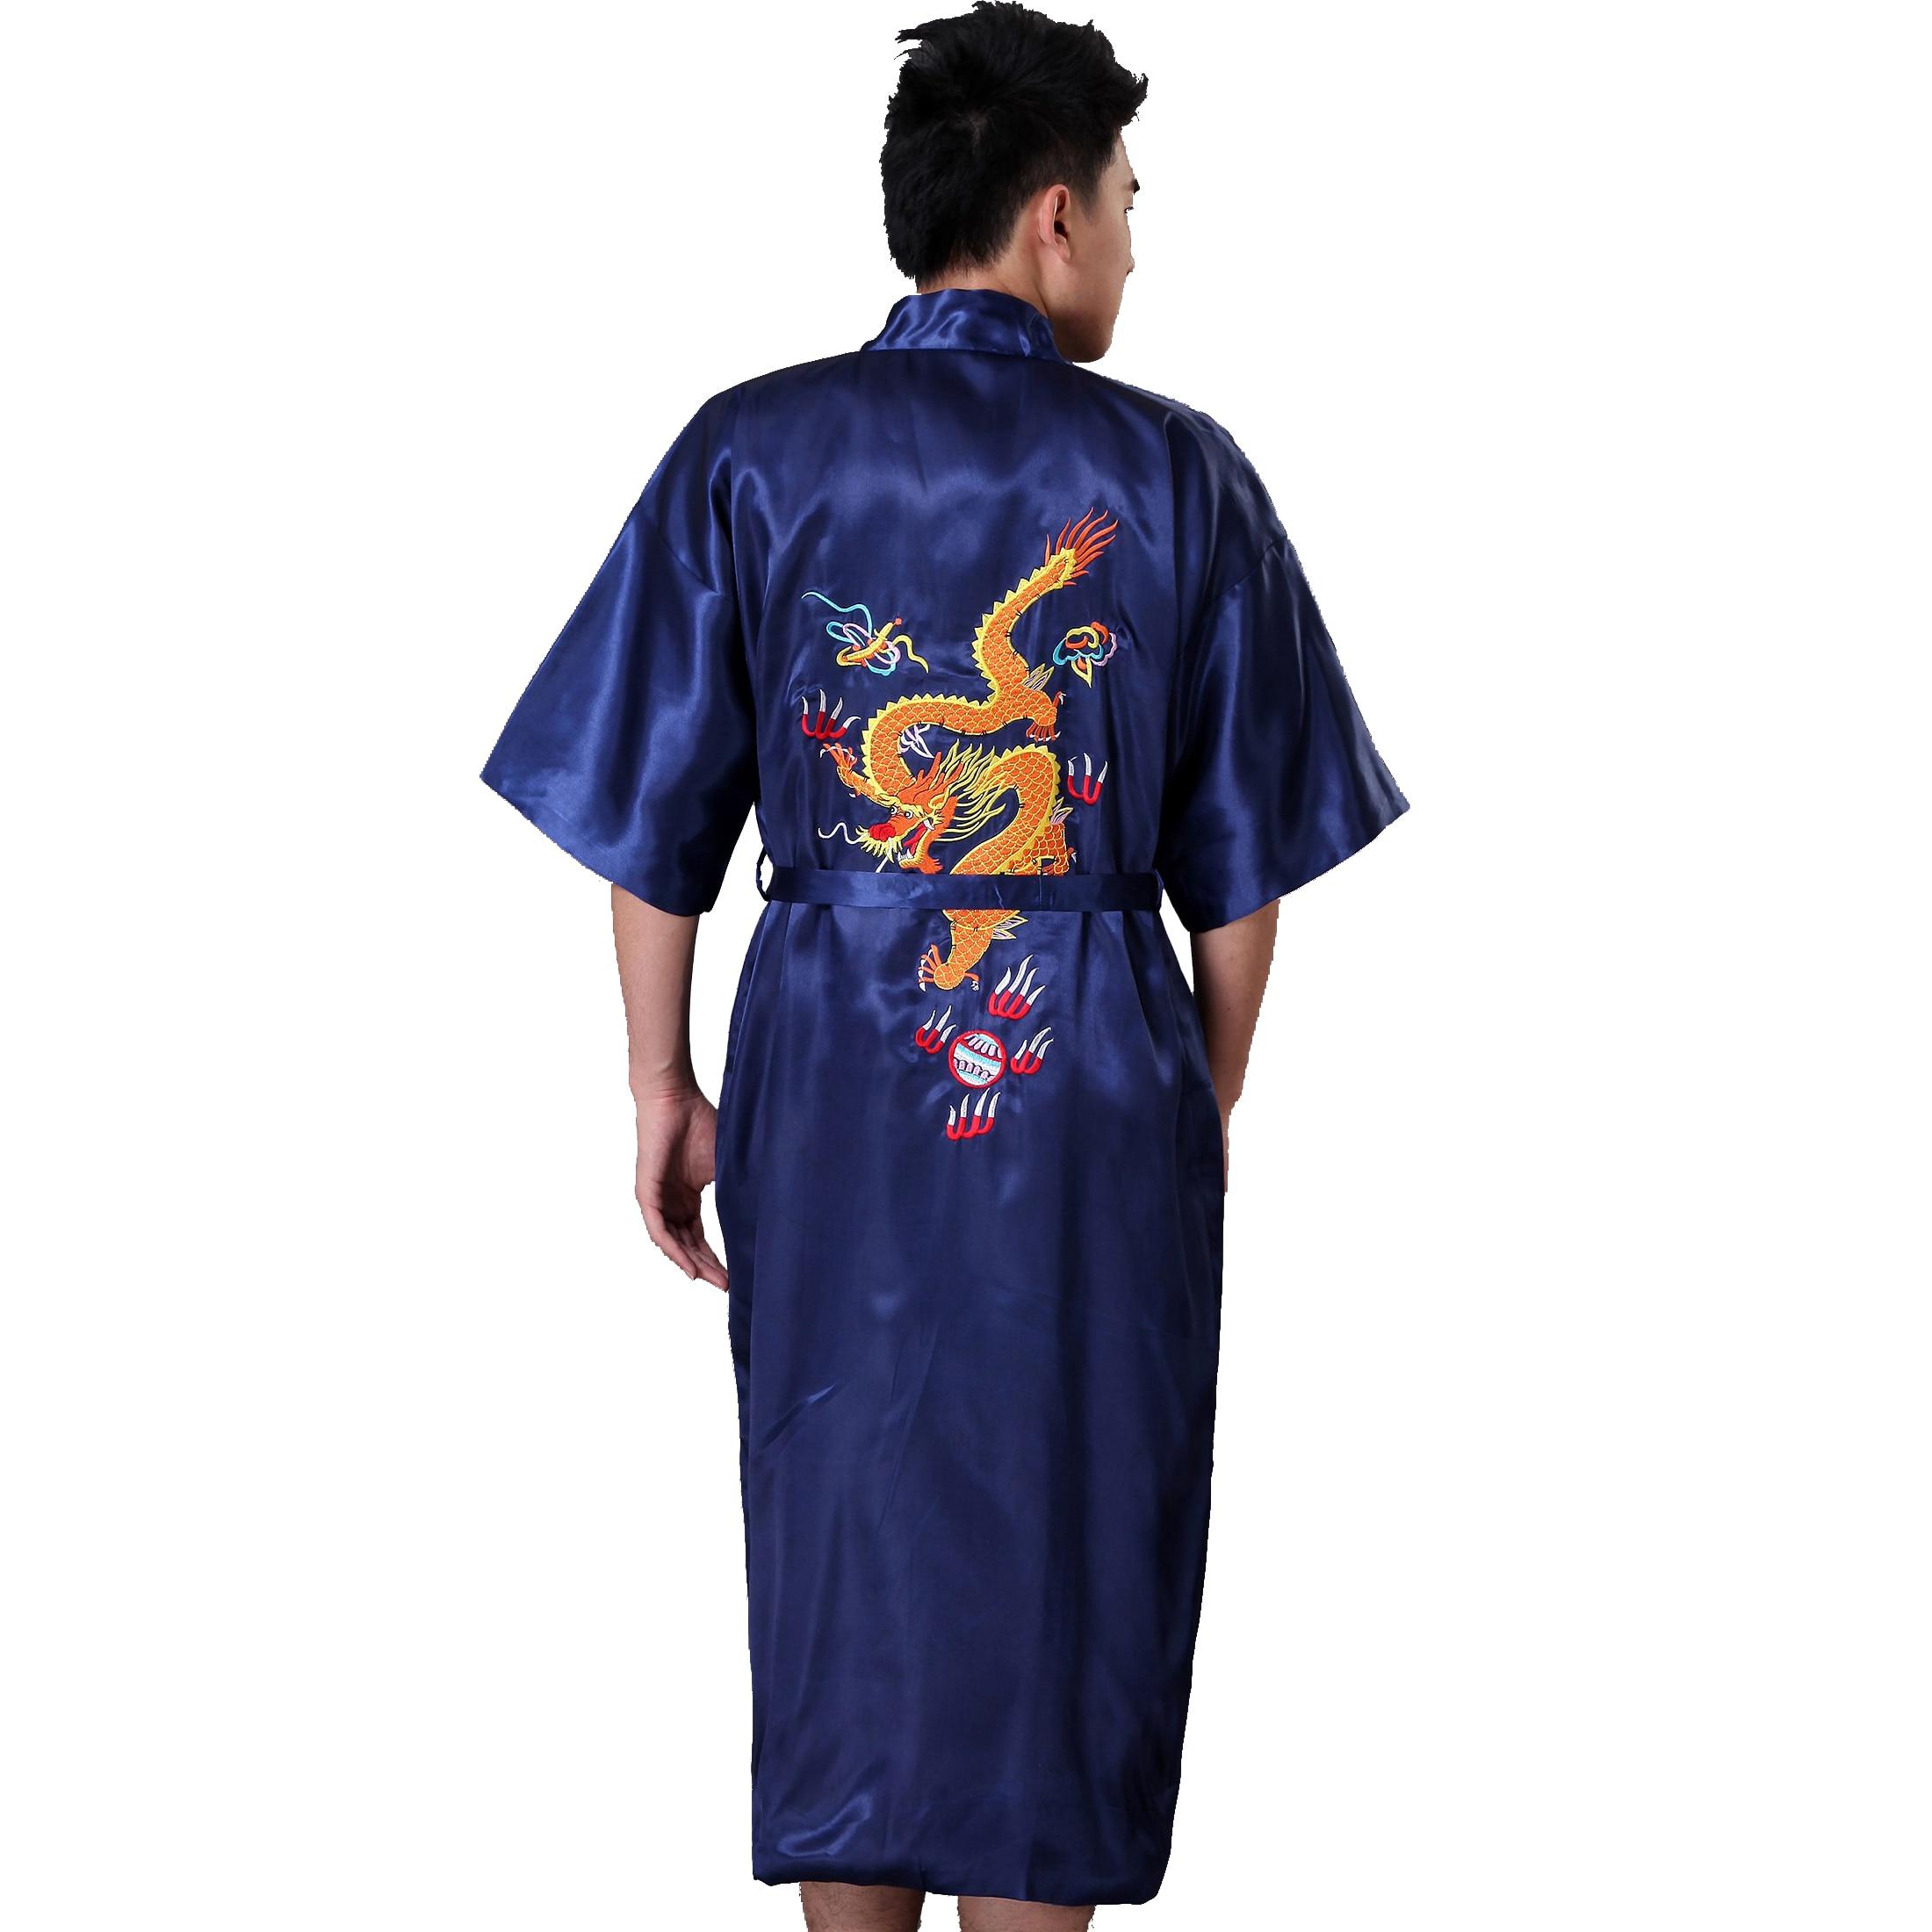 Mens Fleece Robe Loungewear Dressing Gown Bathrobe M L XL XXL